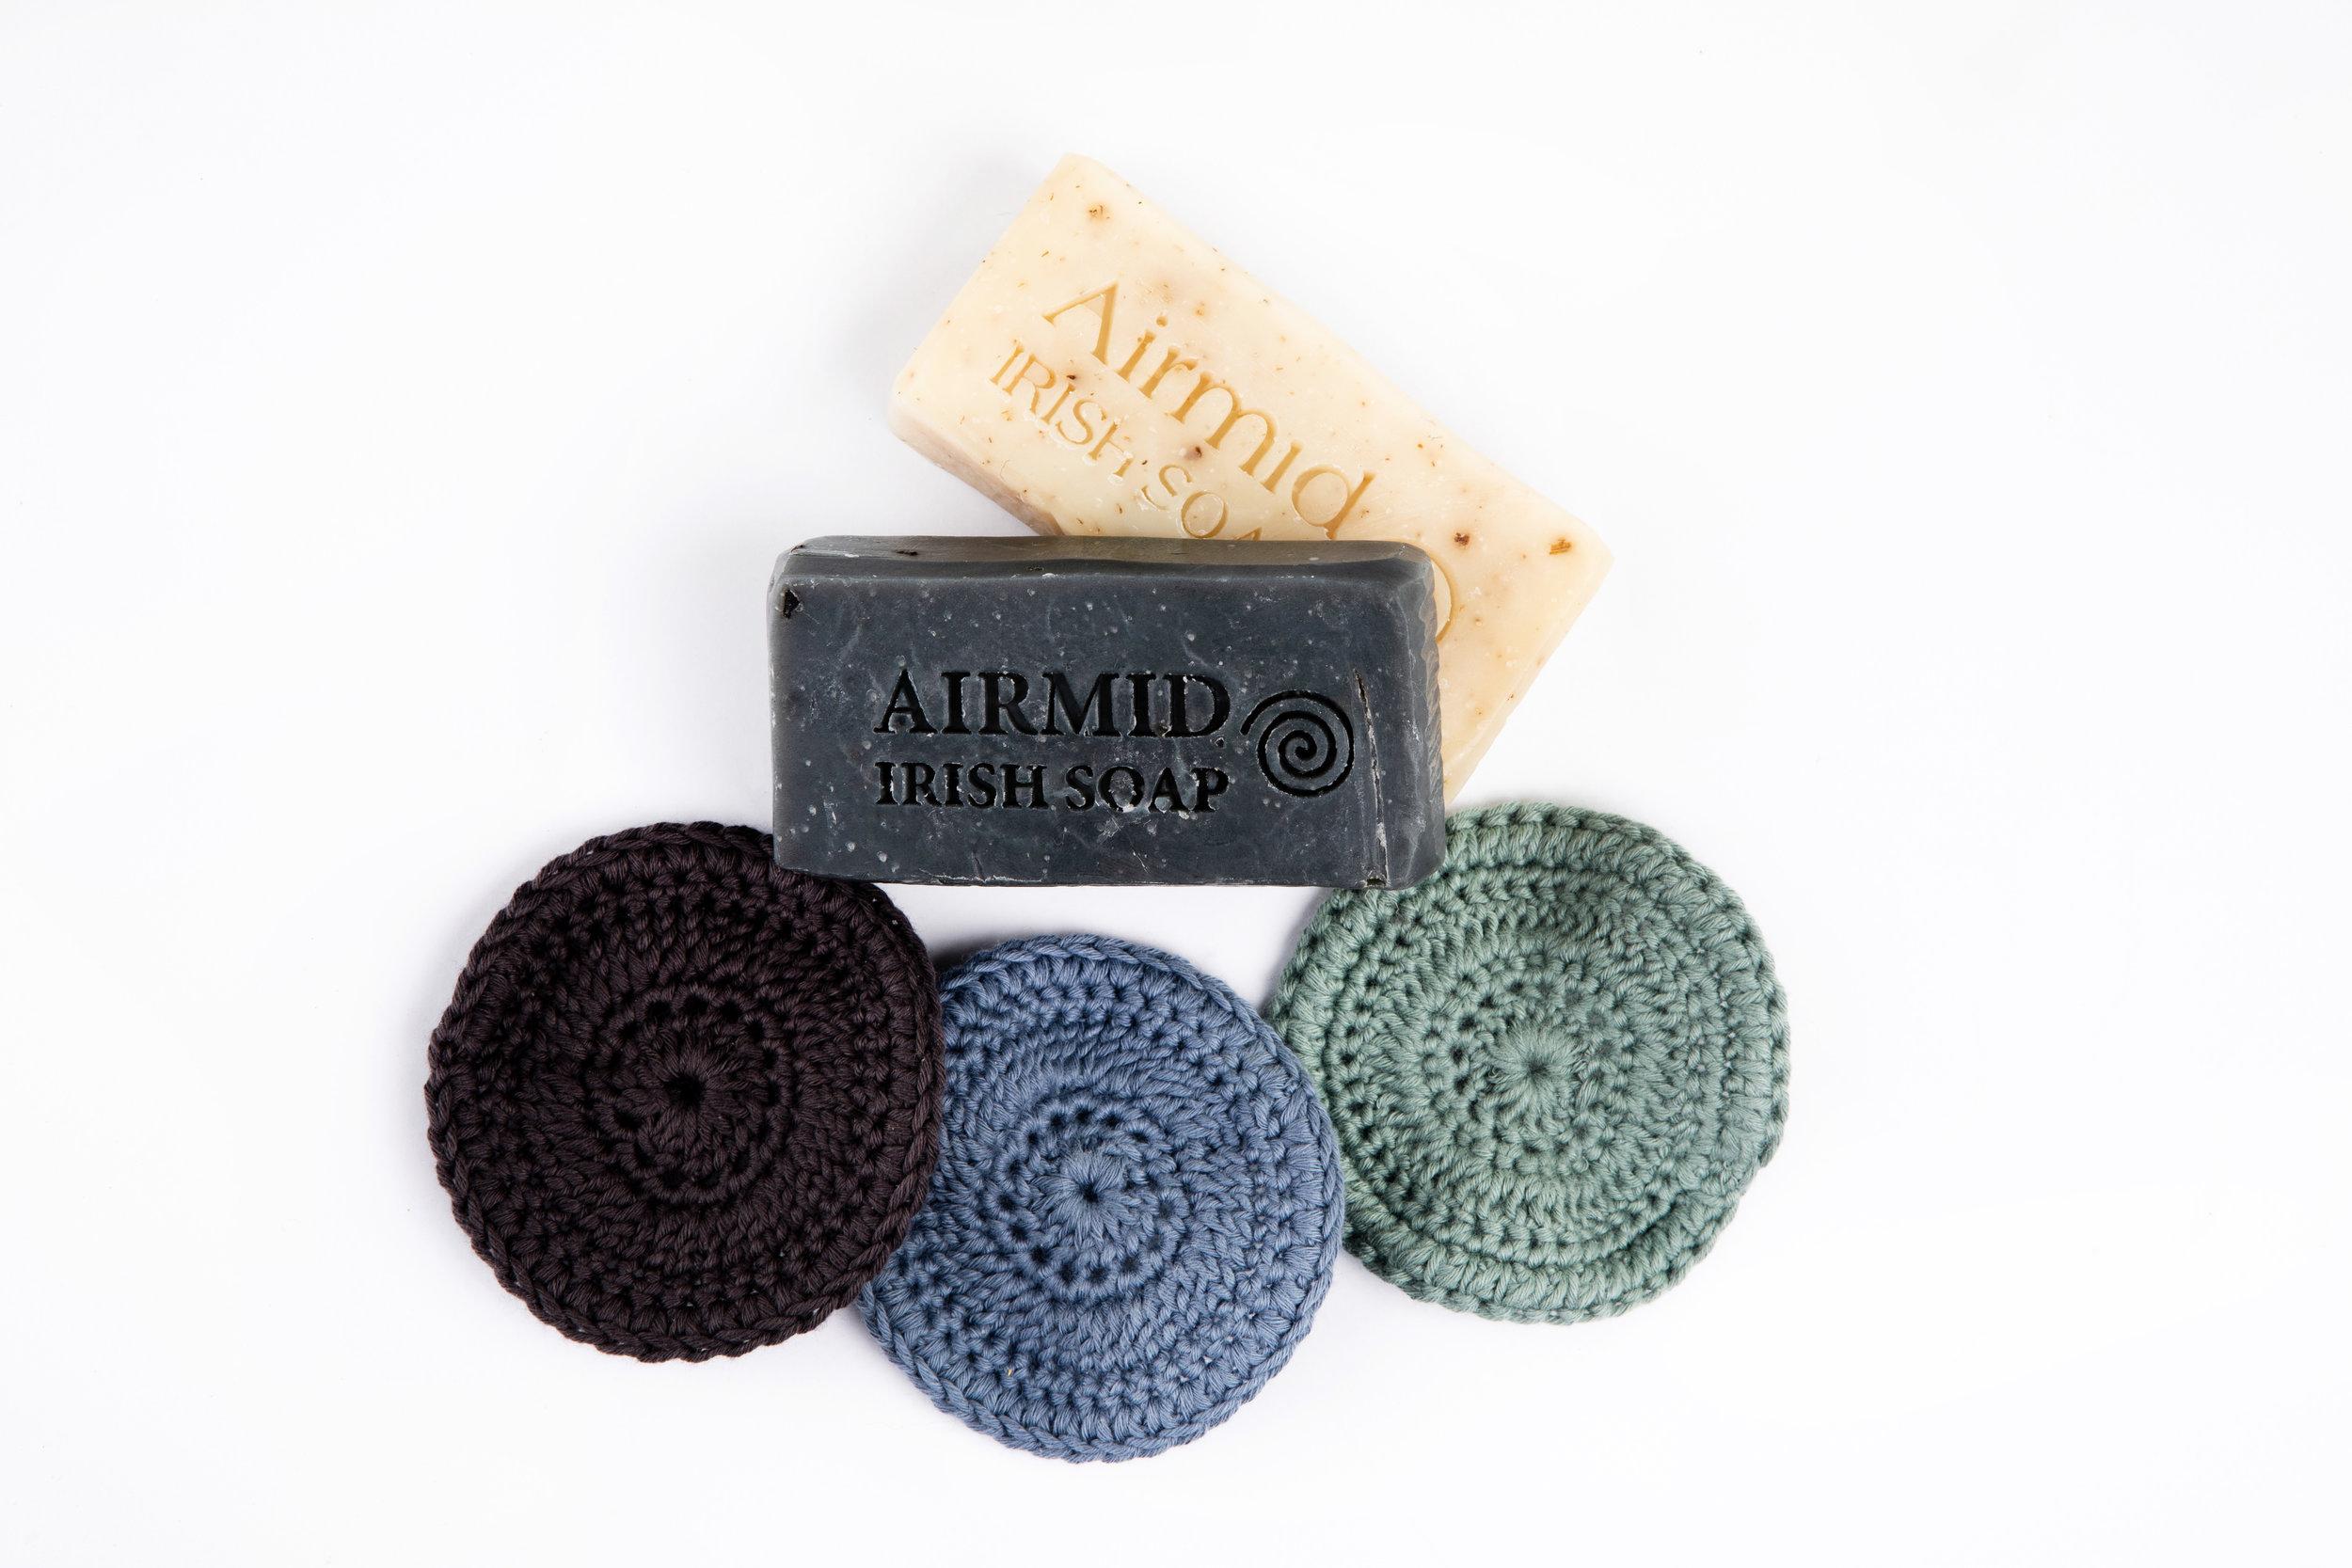 Airmid Products0050.jpg